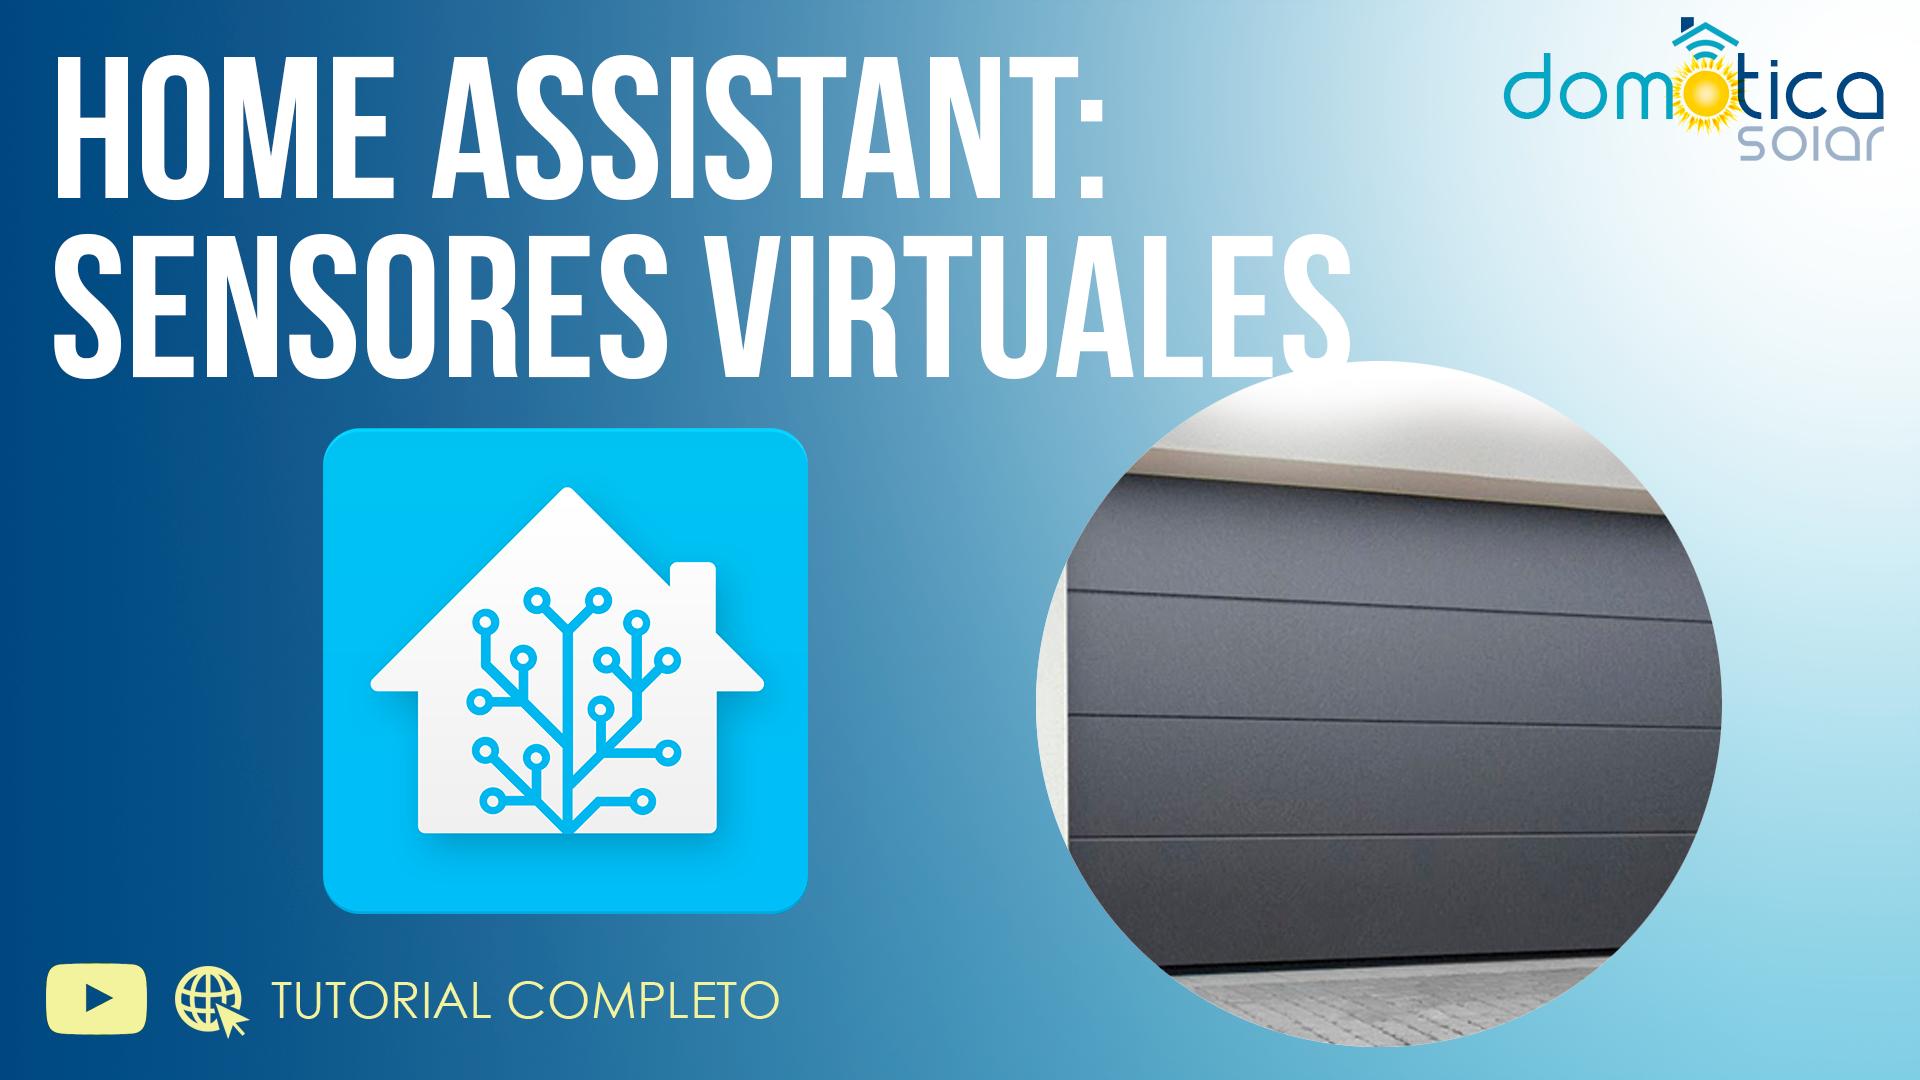 Home Assistant - Sensores Virtuales